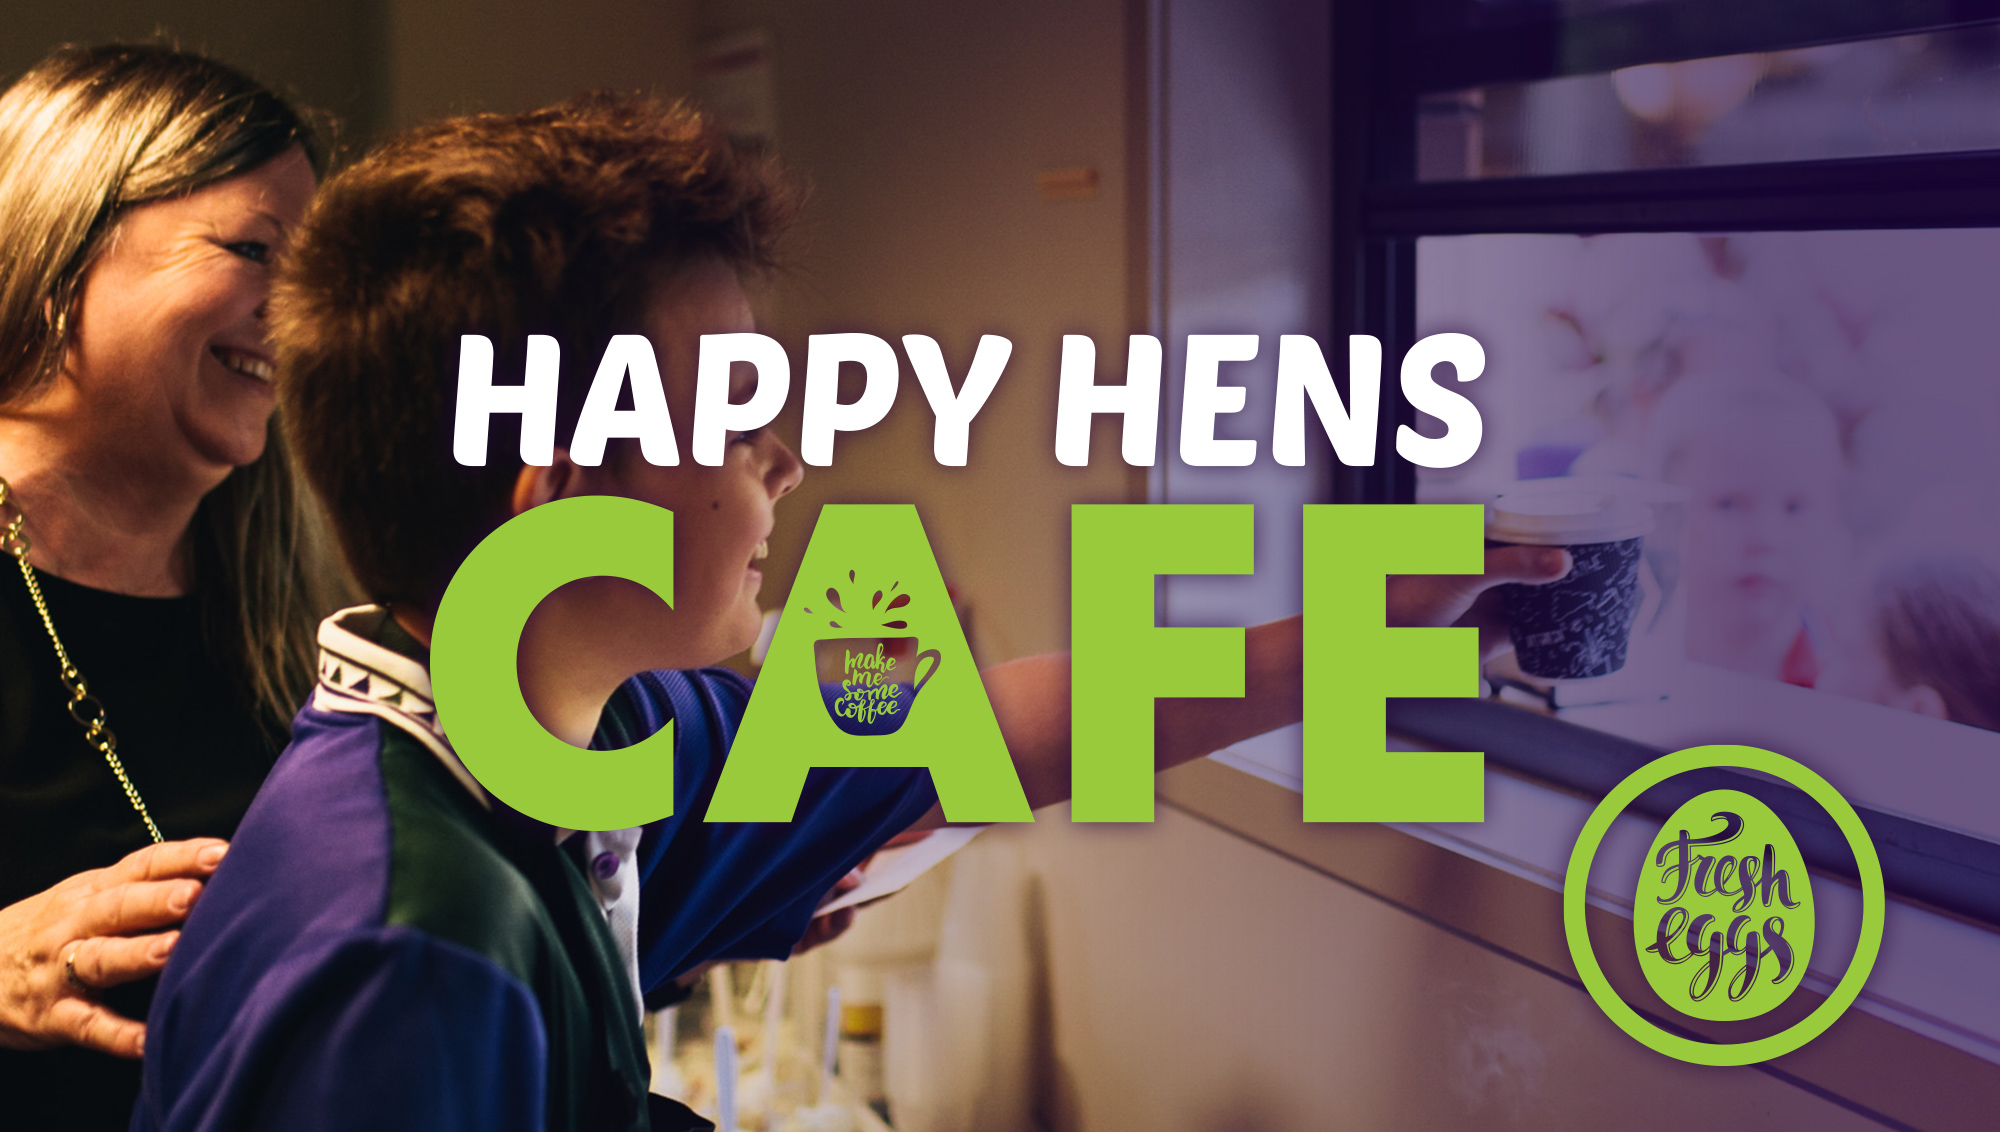 HAPPY-HENS.jpg